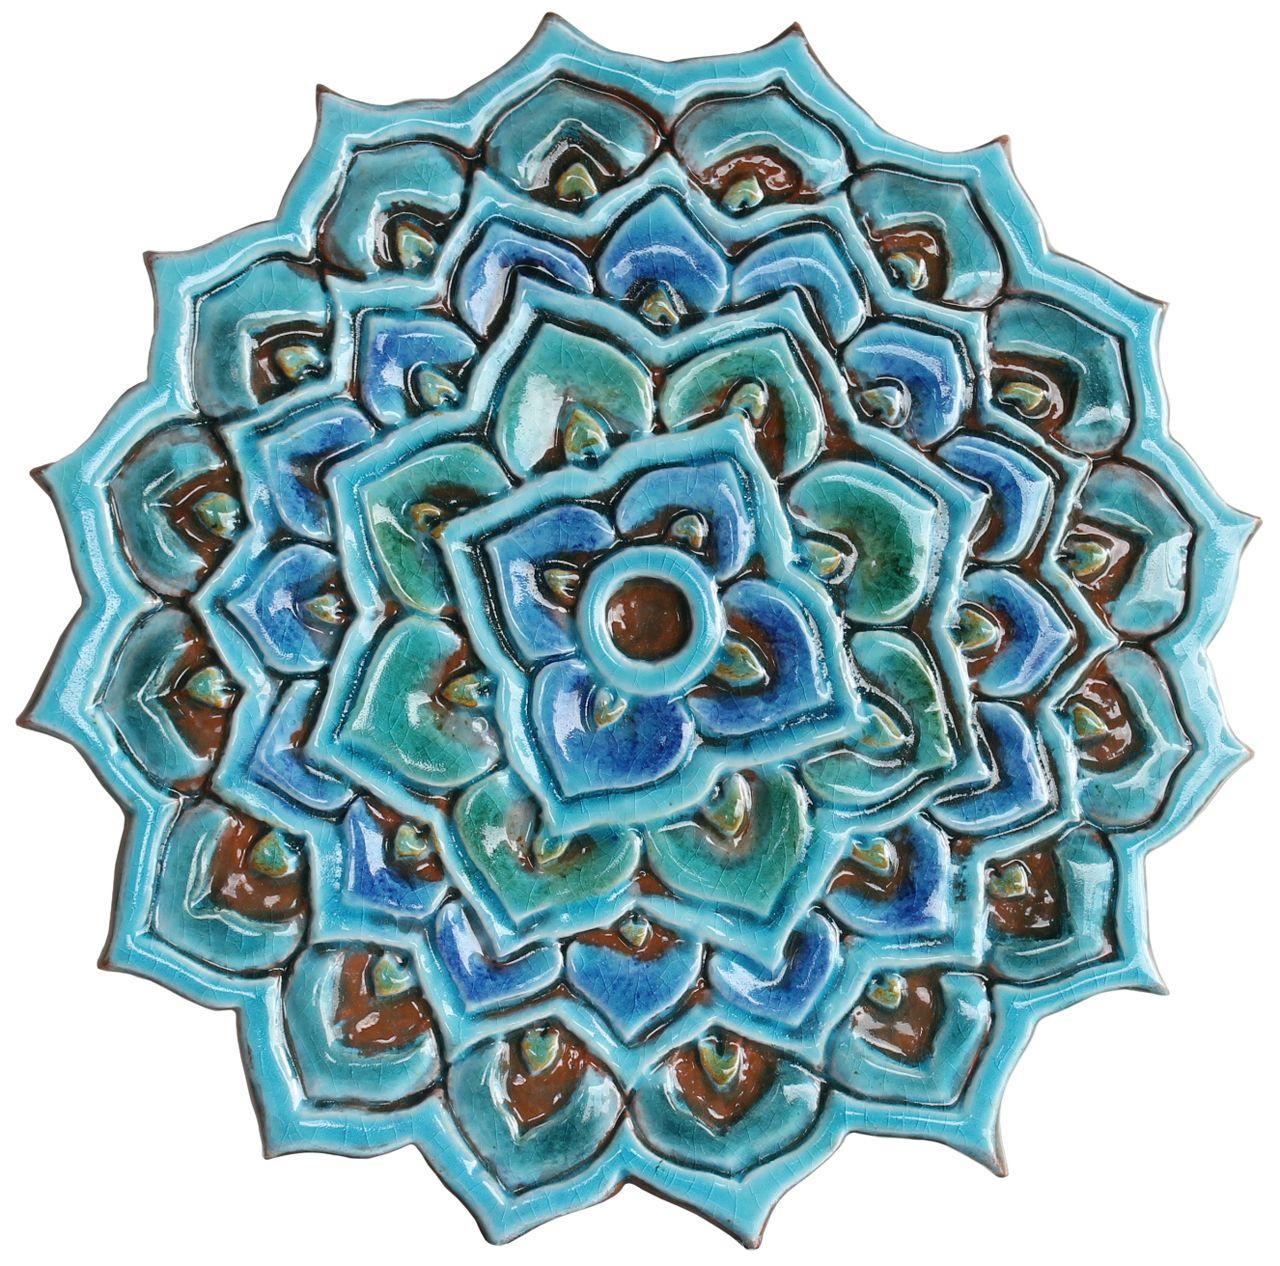 Image result for moroccan mandala mandalas pinterest moroccan mandala wall decor made from ceramic outdoor wall art ceramic tile mandala 2 cutout turquoise dailygadgetfo Gallery